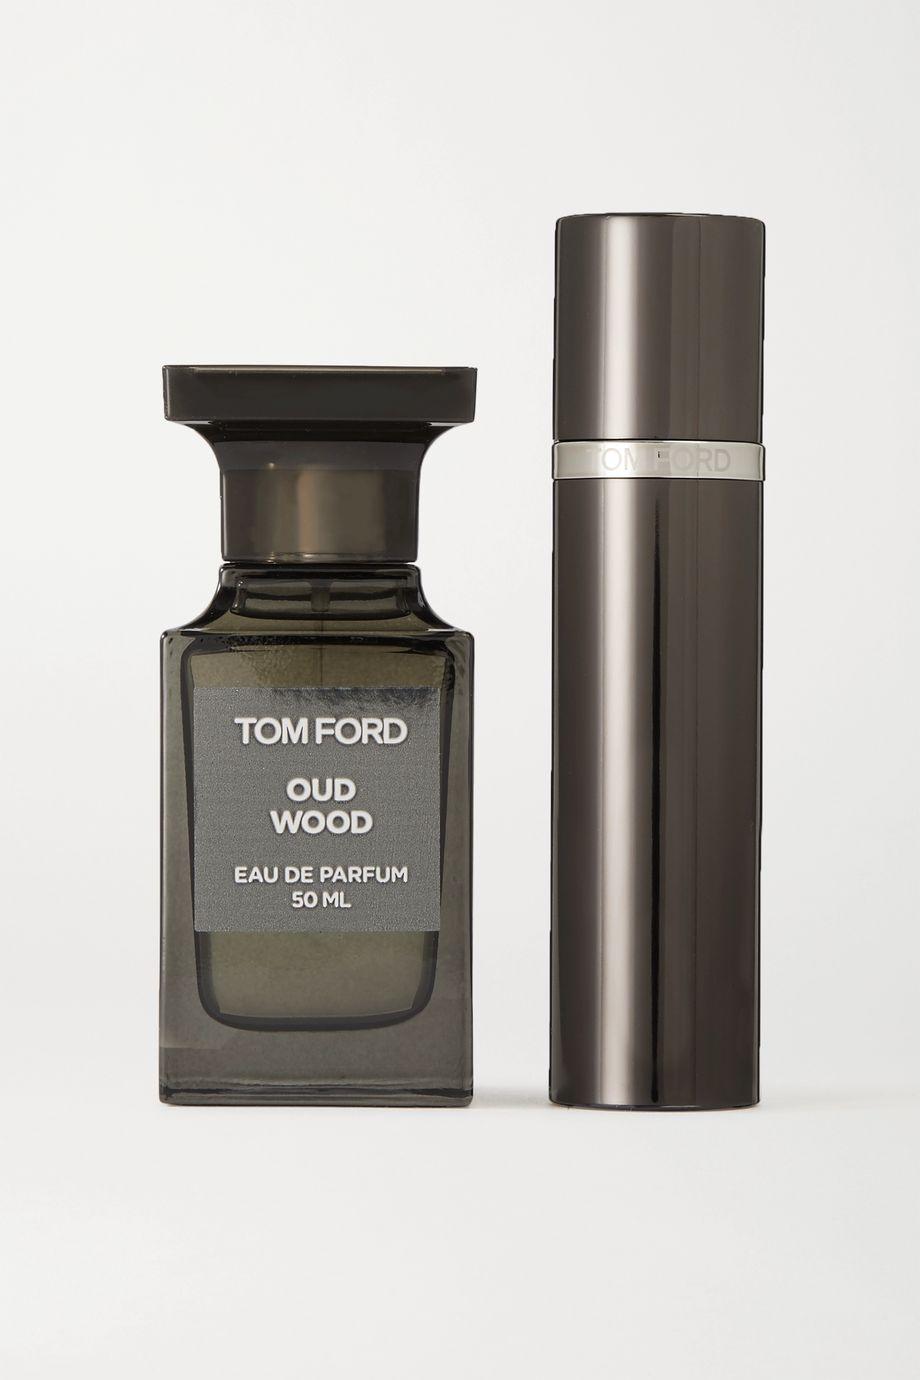 TOM FORD BEAUTY Eau de Parfum Gift Set - Oud Wood, 50ml & 10ml